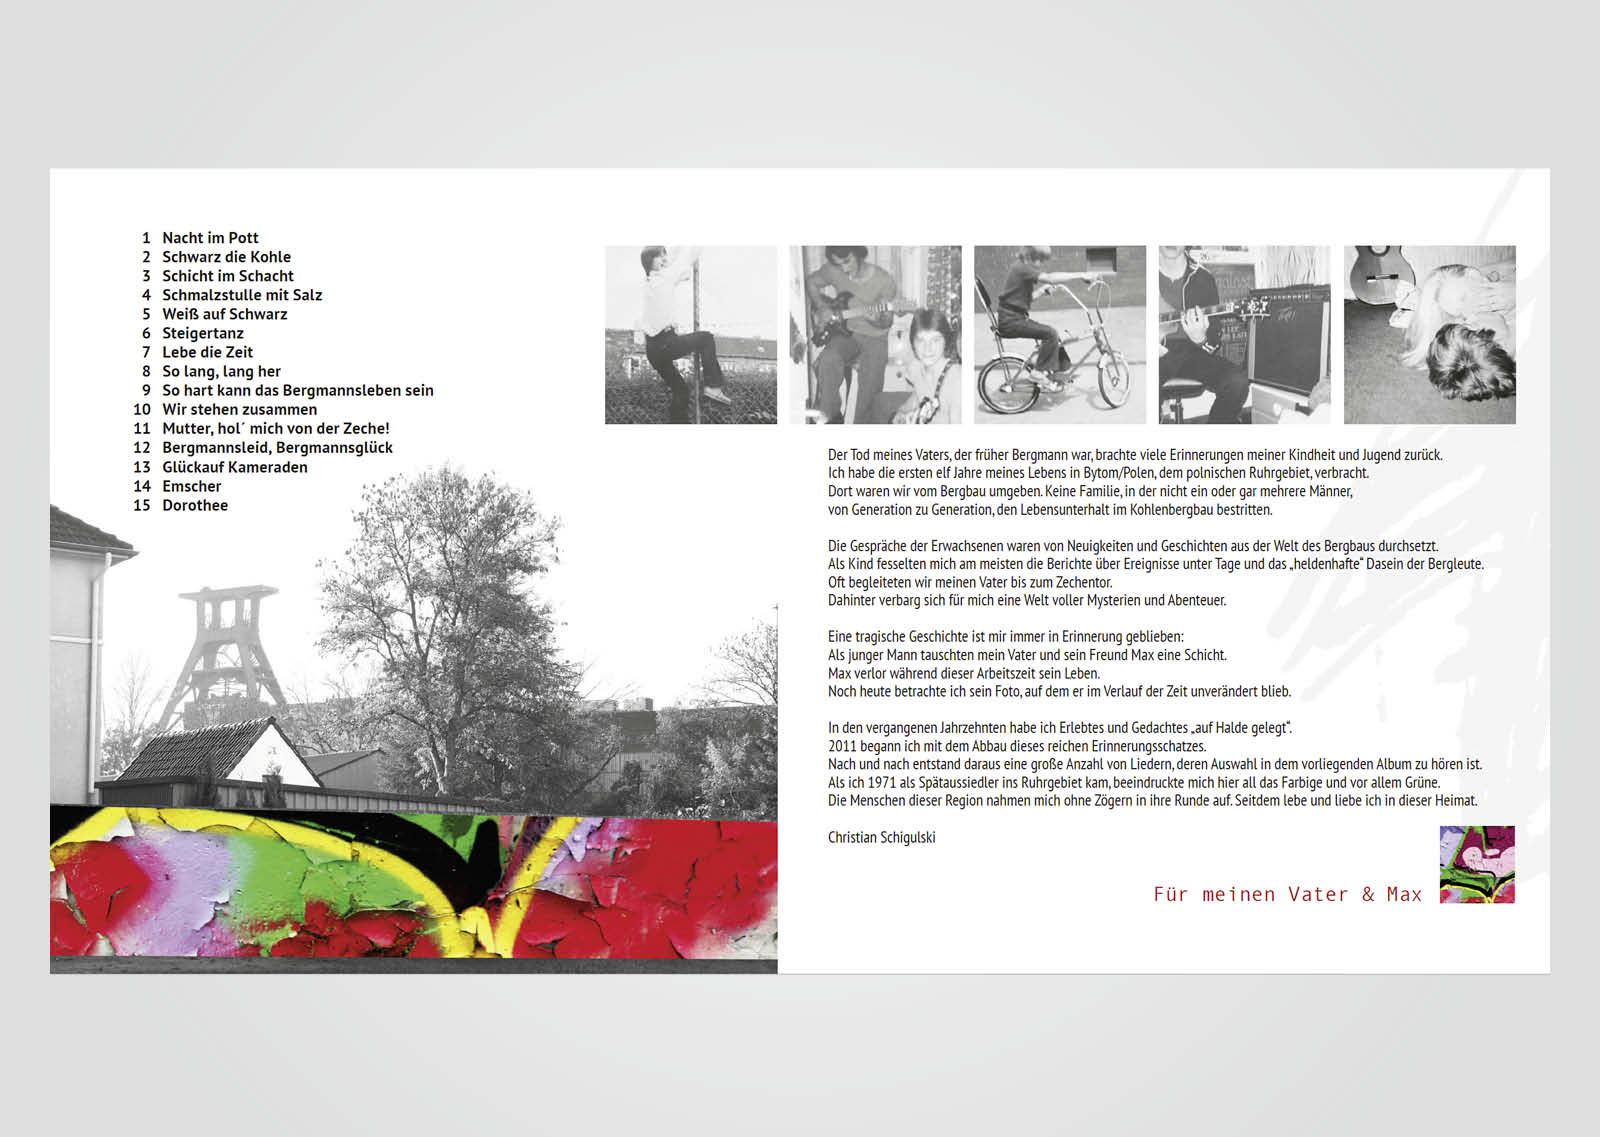 corporate-design-schigulski-musik-11.jpg